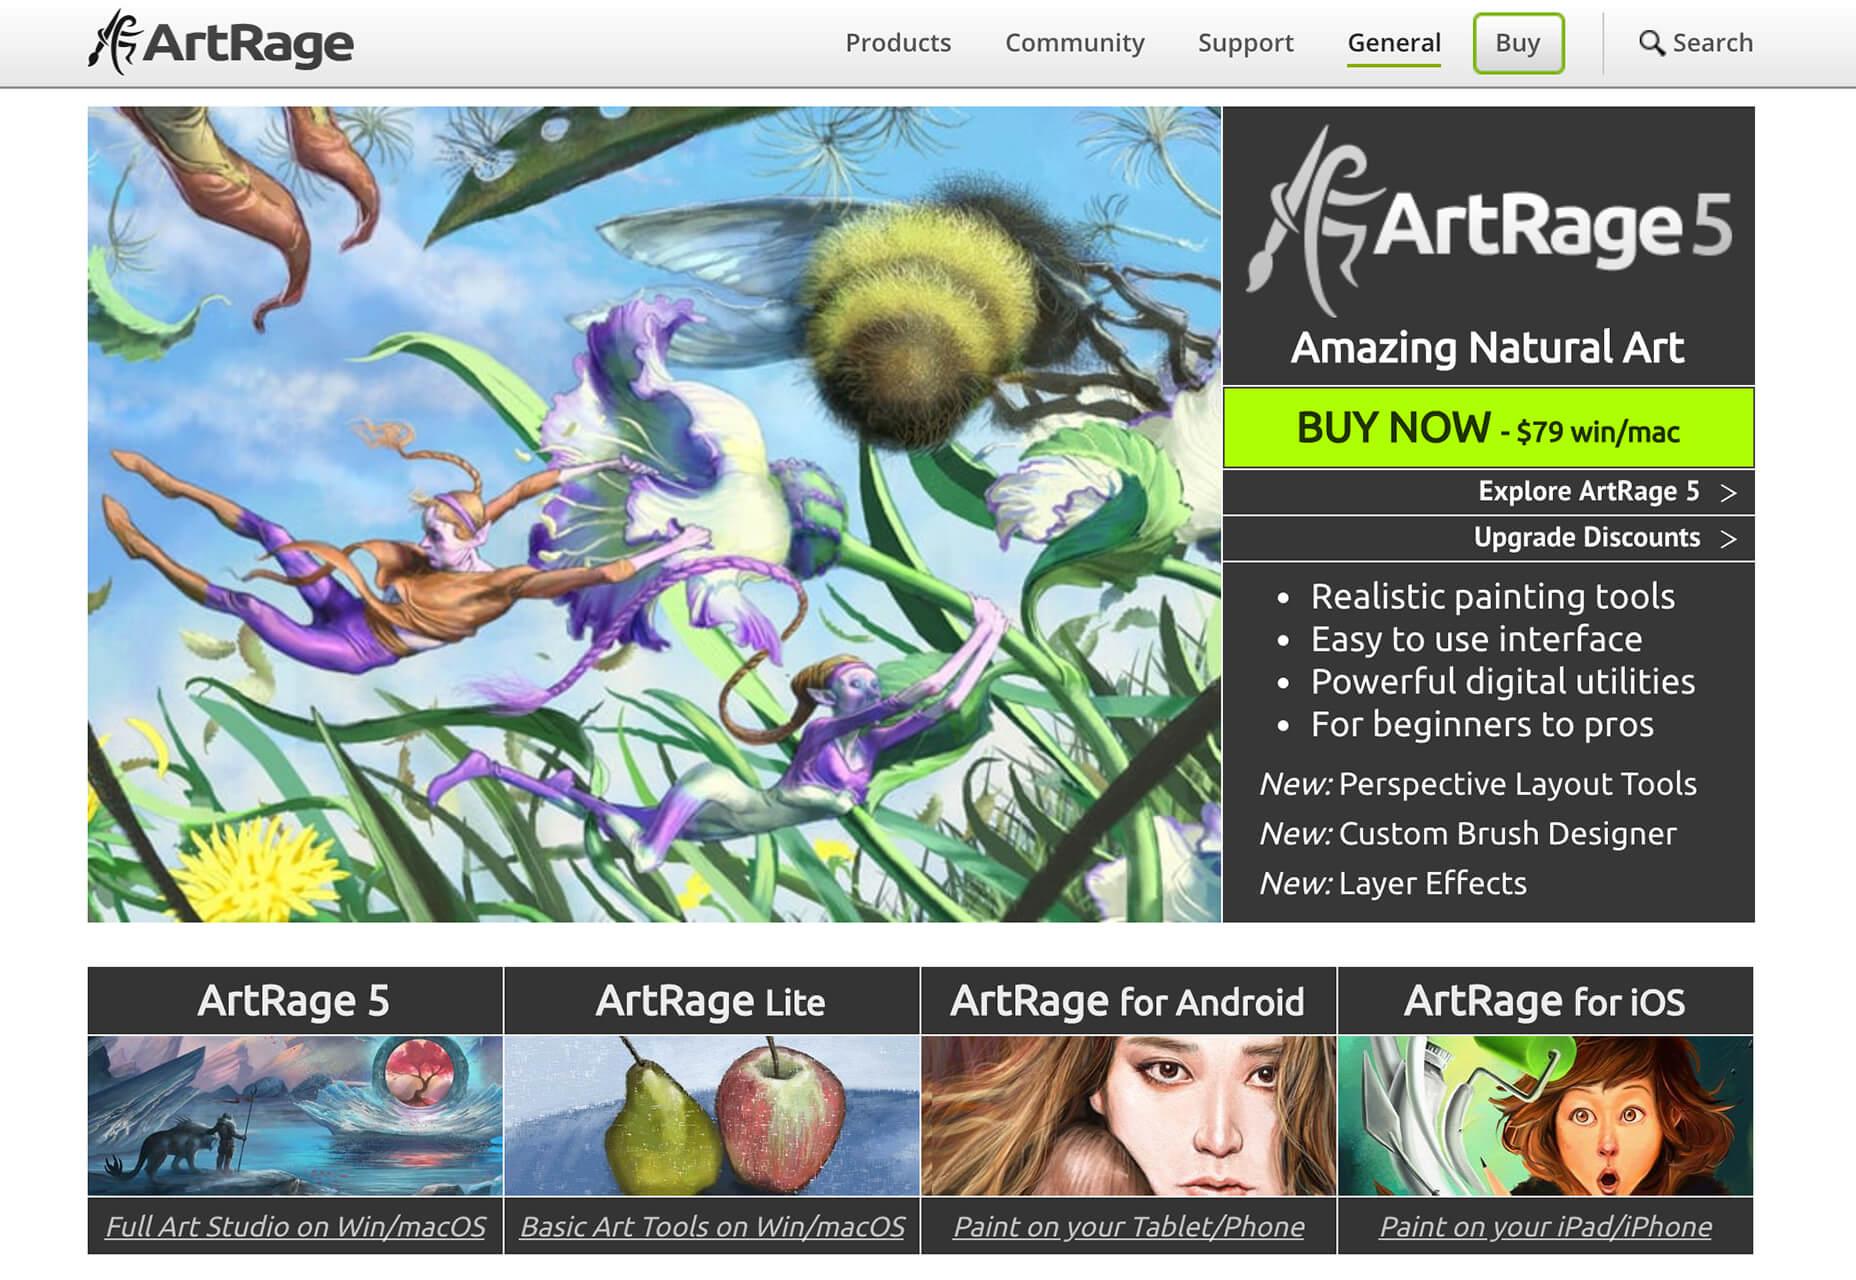 ArtRage